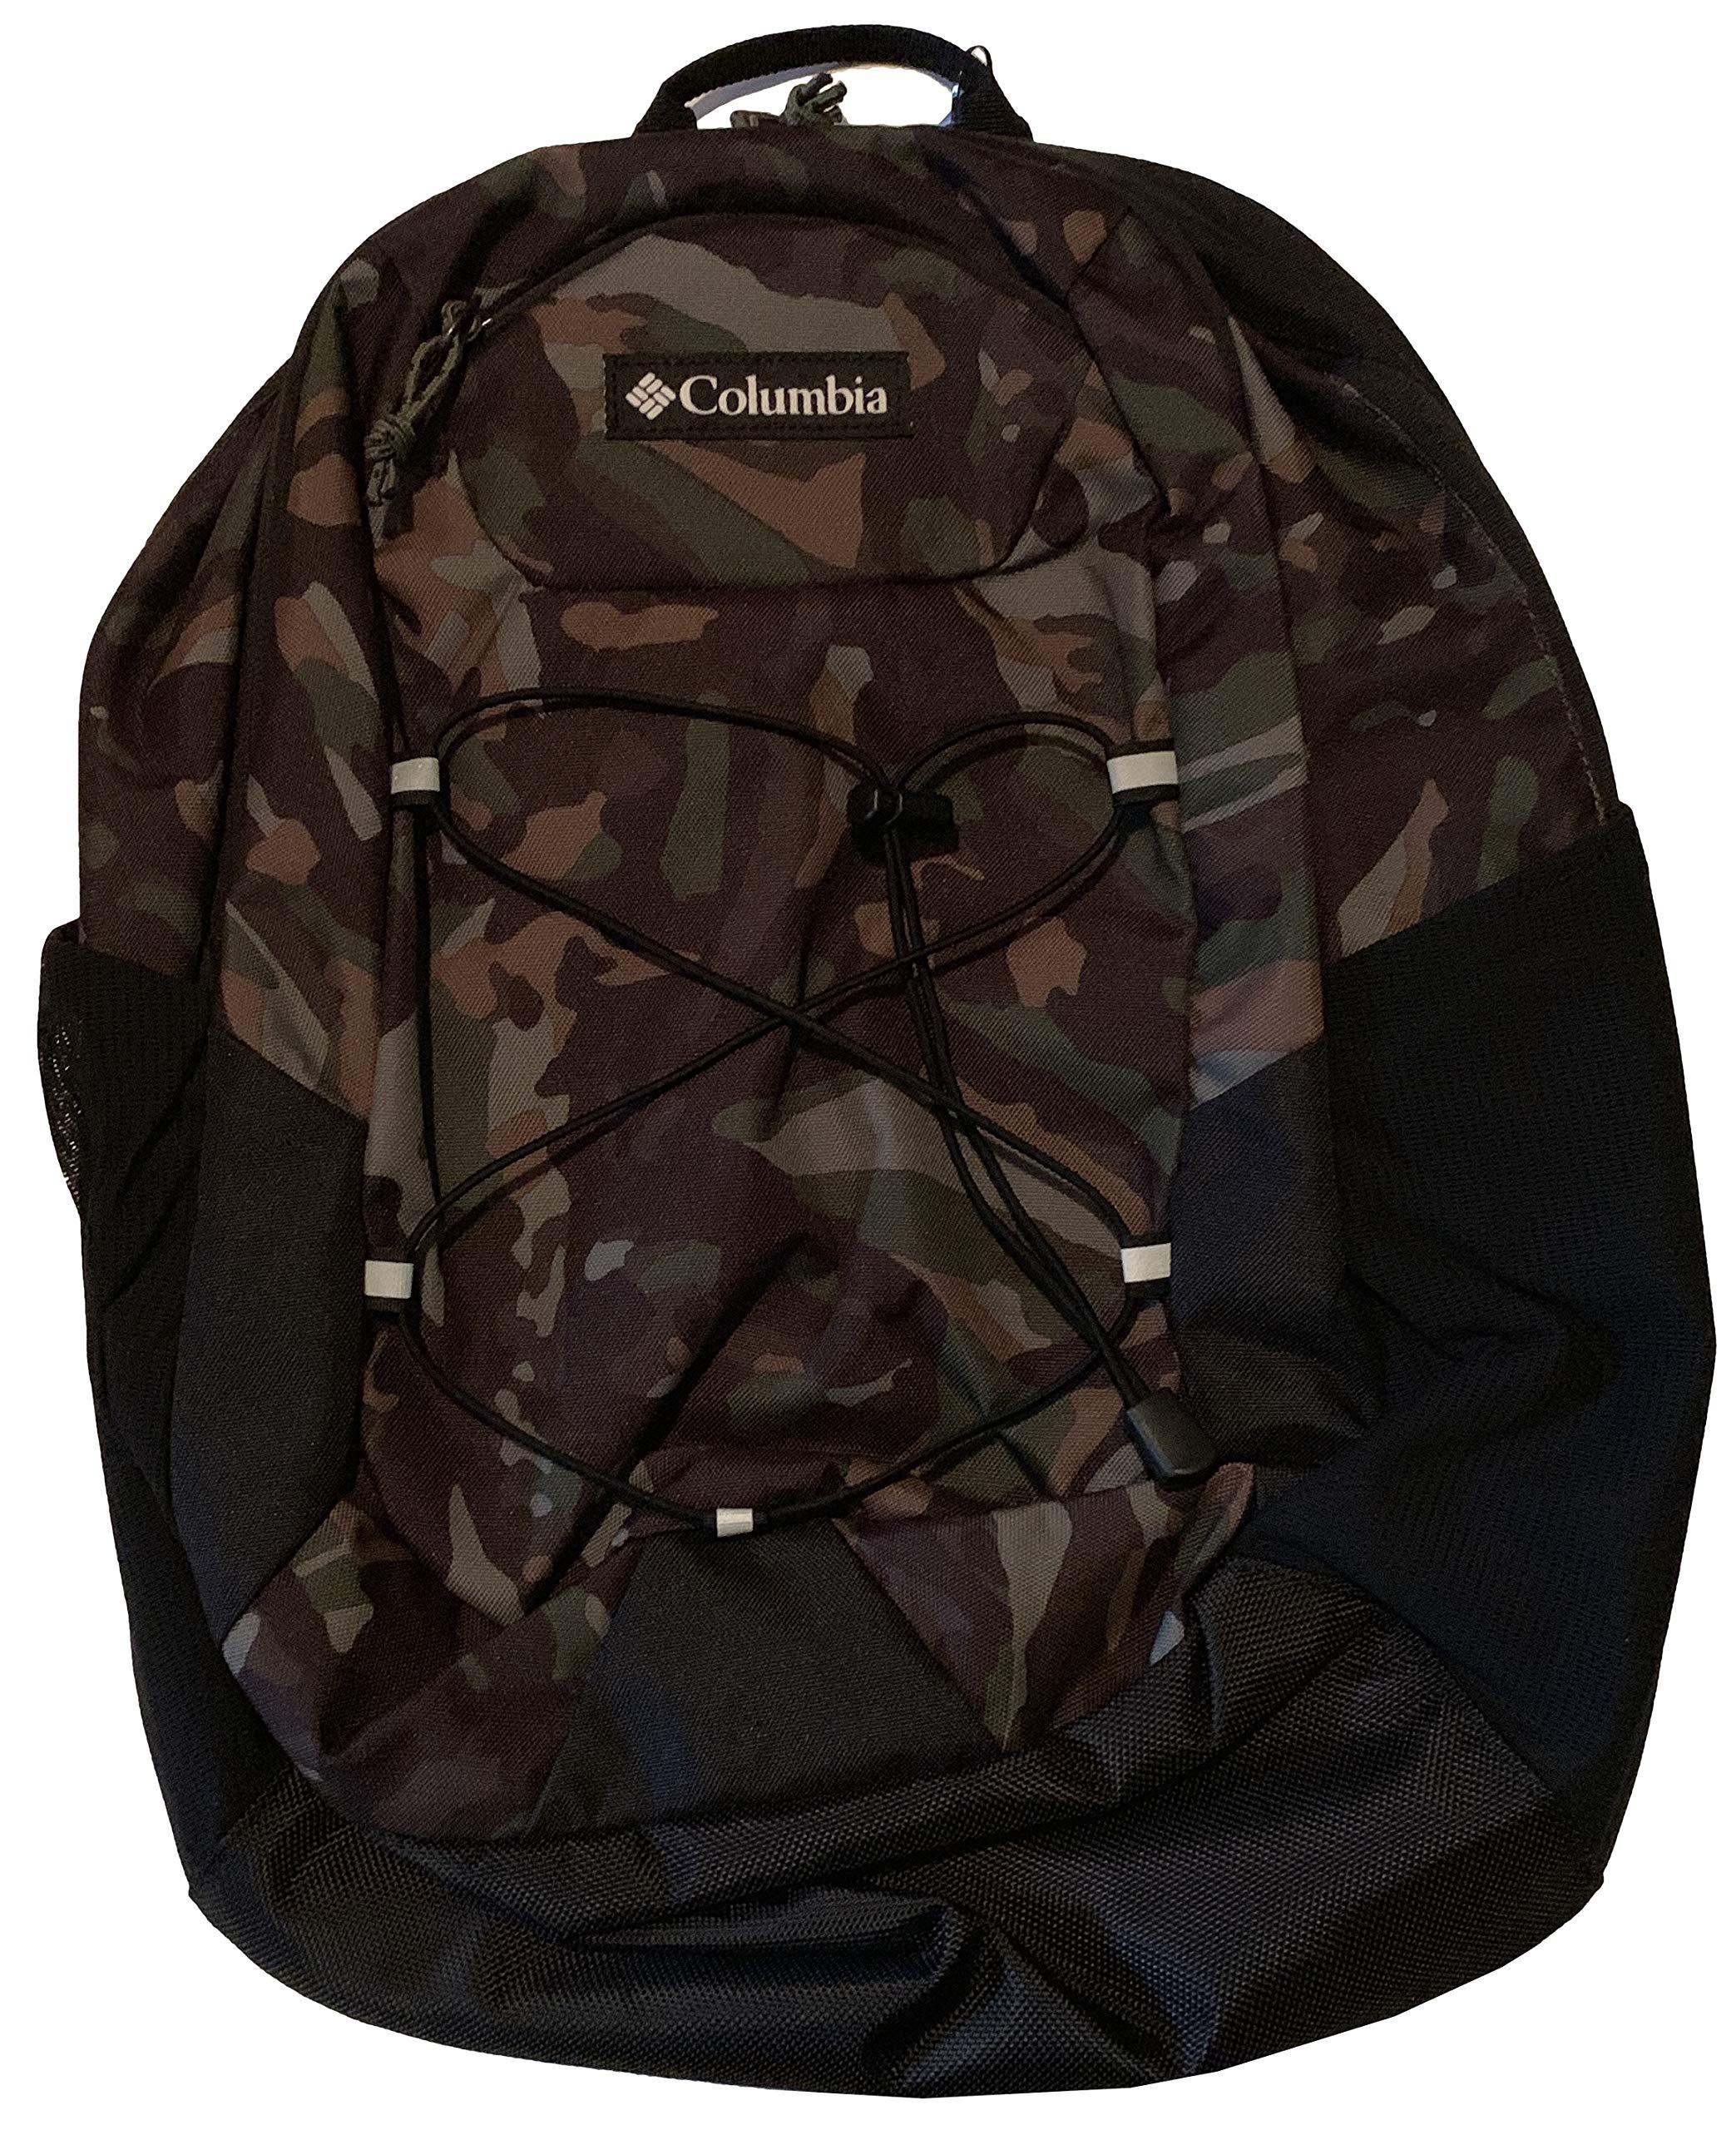 Columbia Northport II Daypack Backpack (Camo Black)